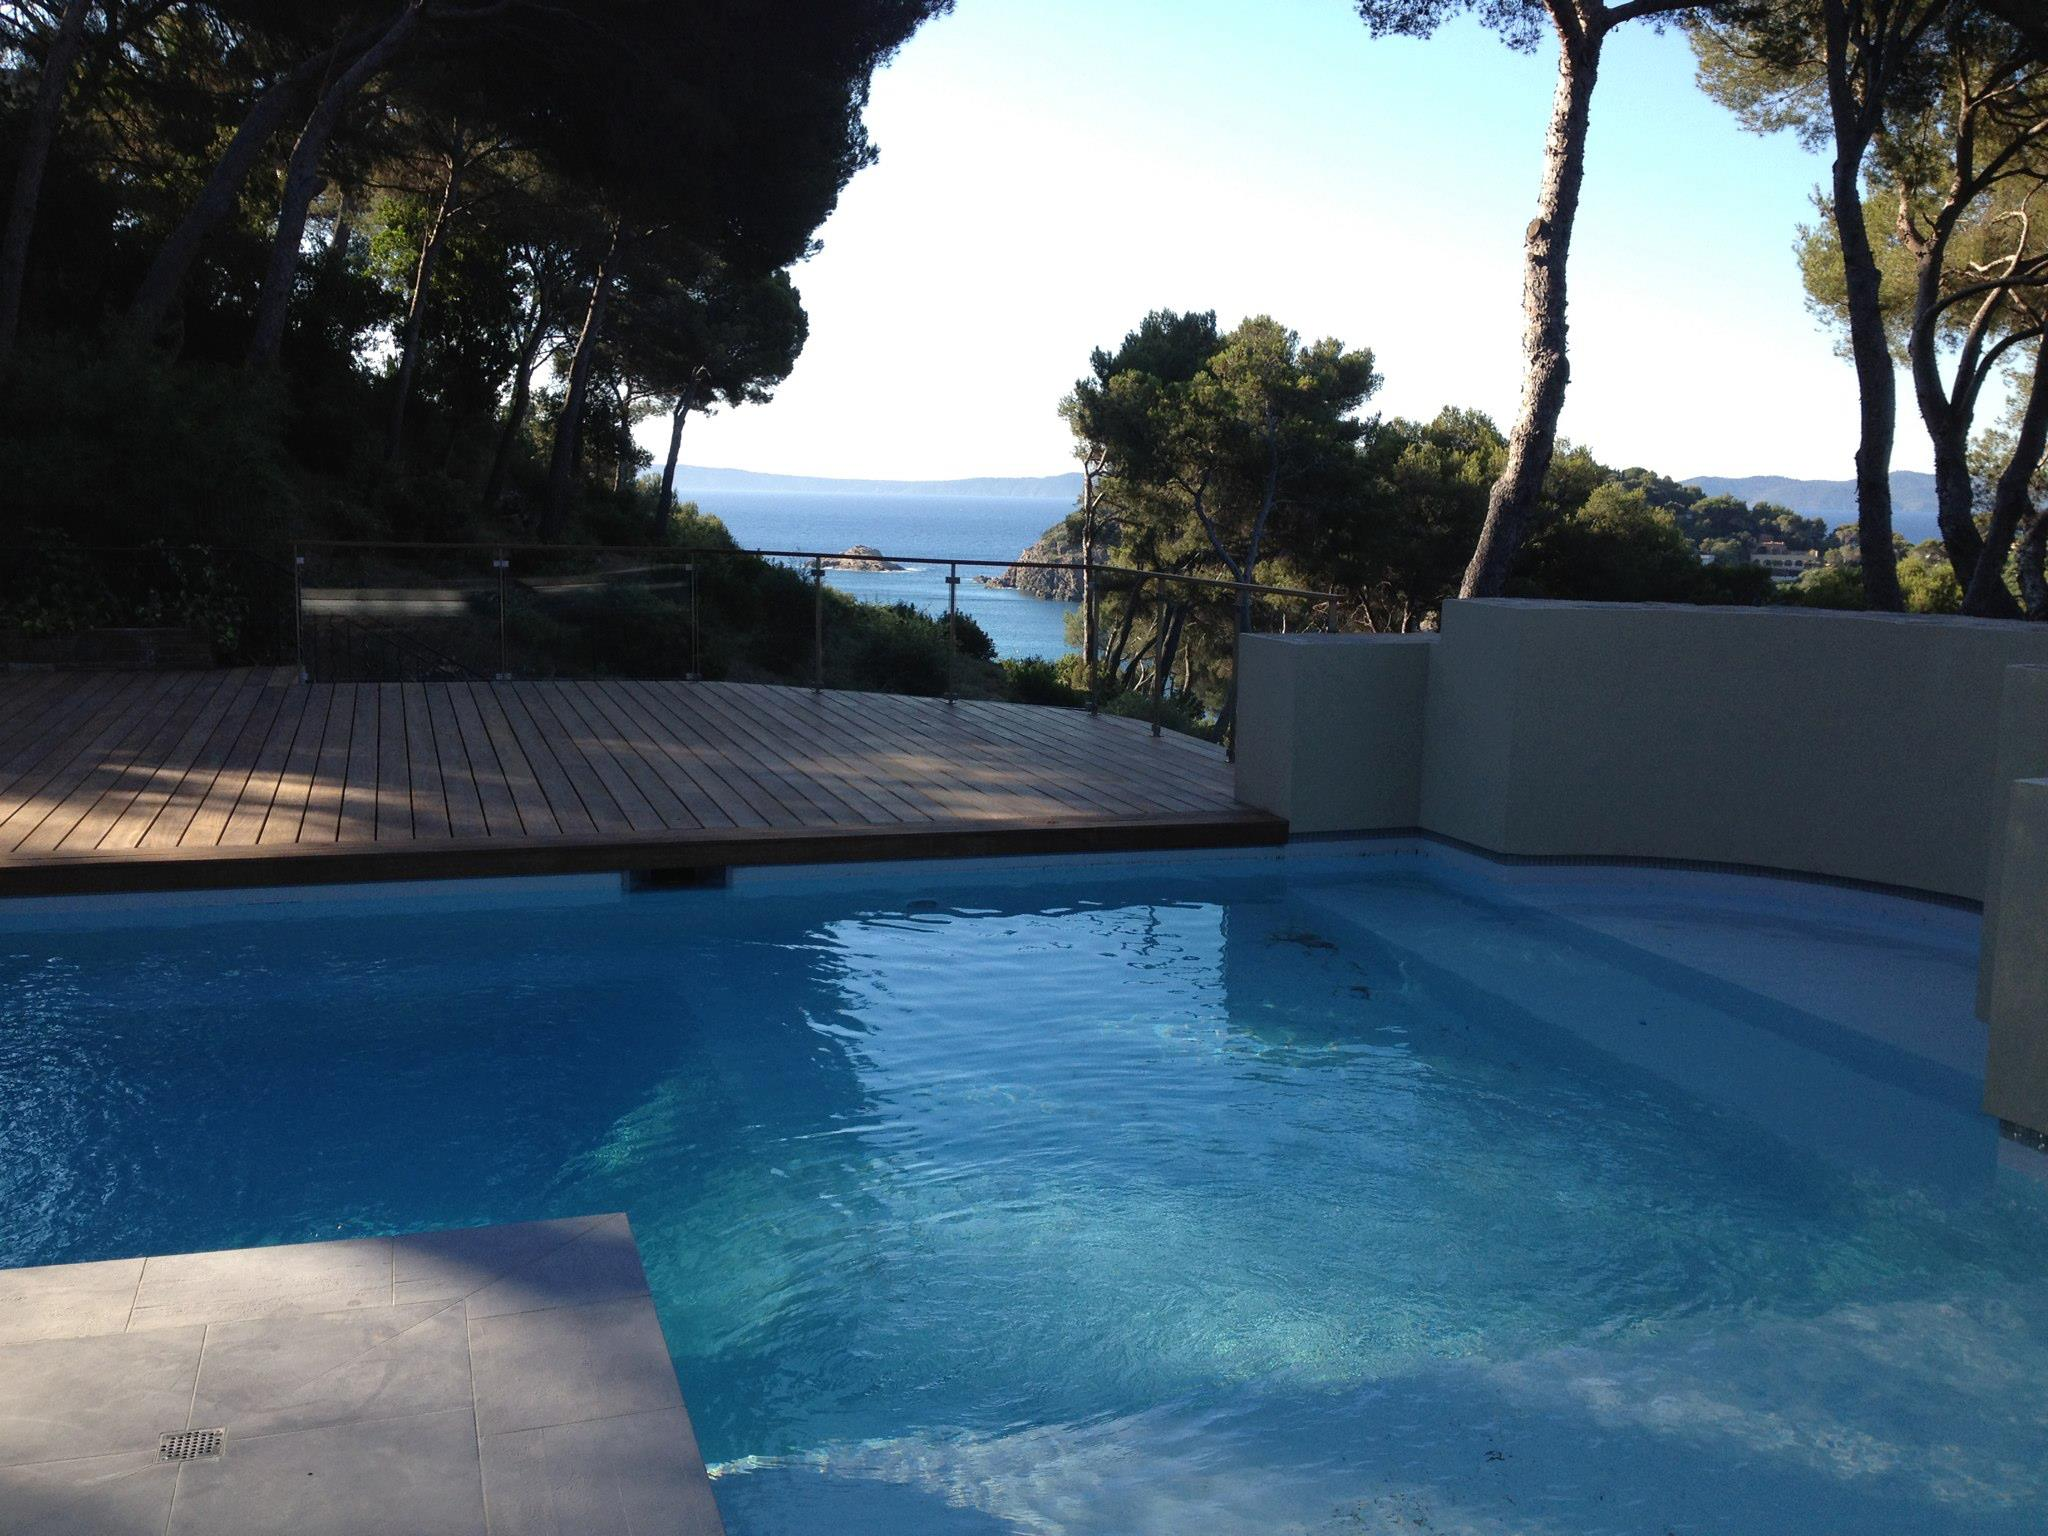 Projet c r habilitation d 39 une piscine au cap b nat for Zeolite piscine